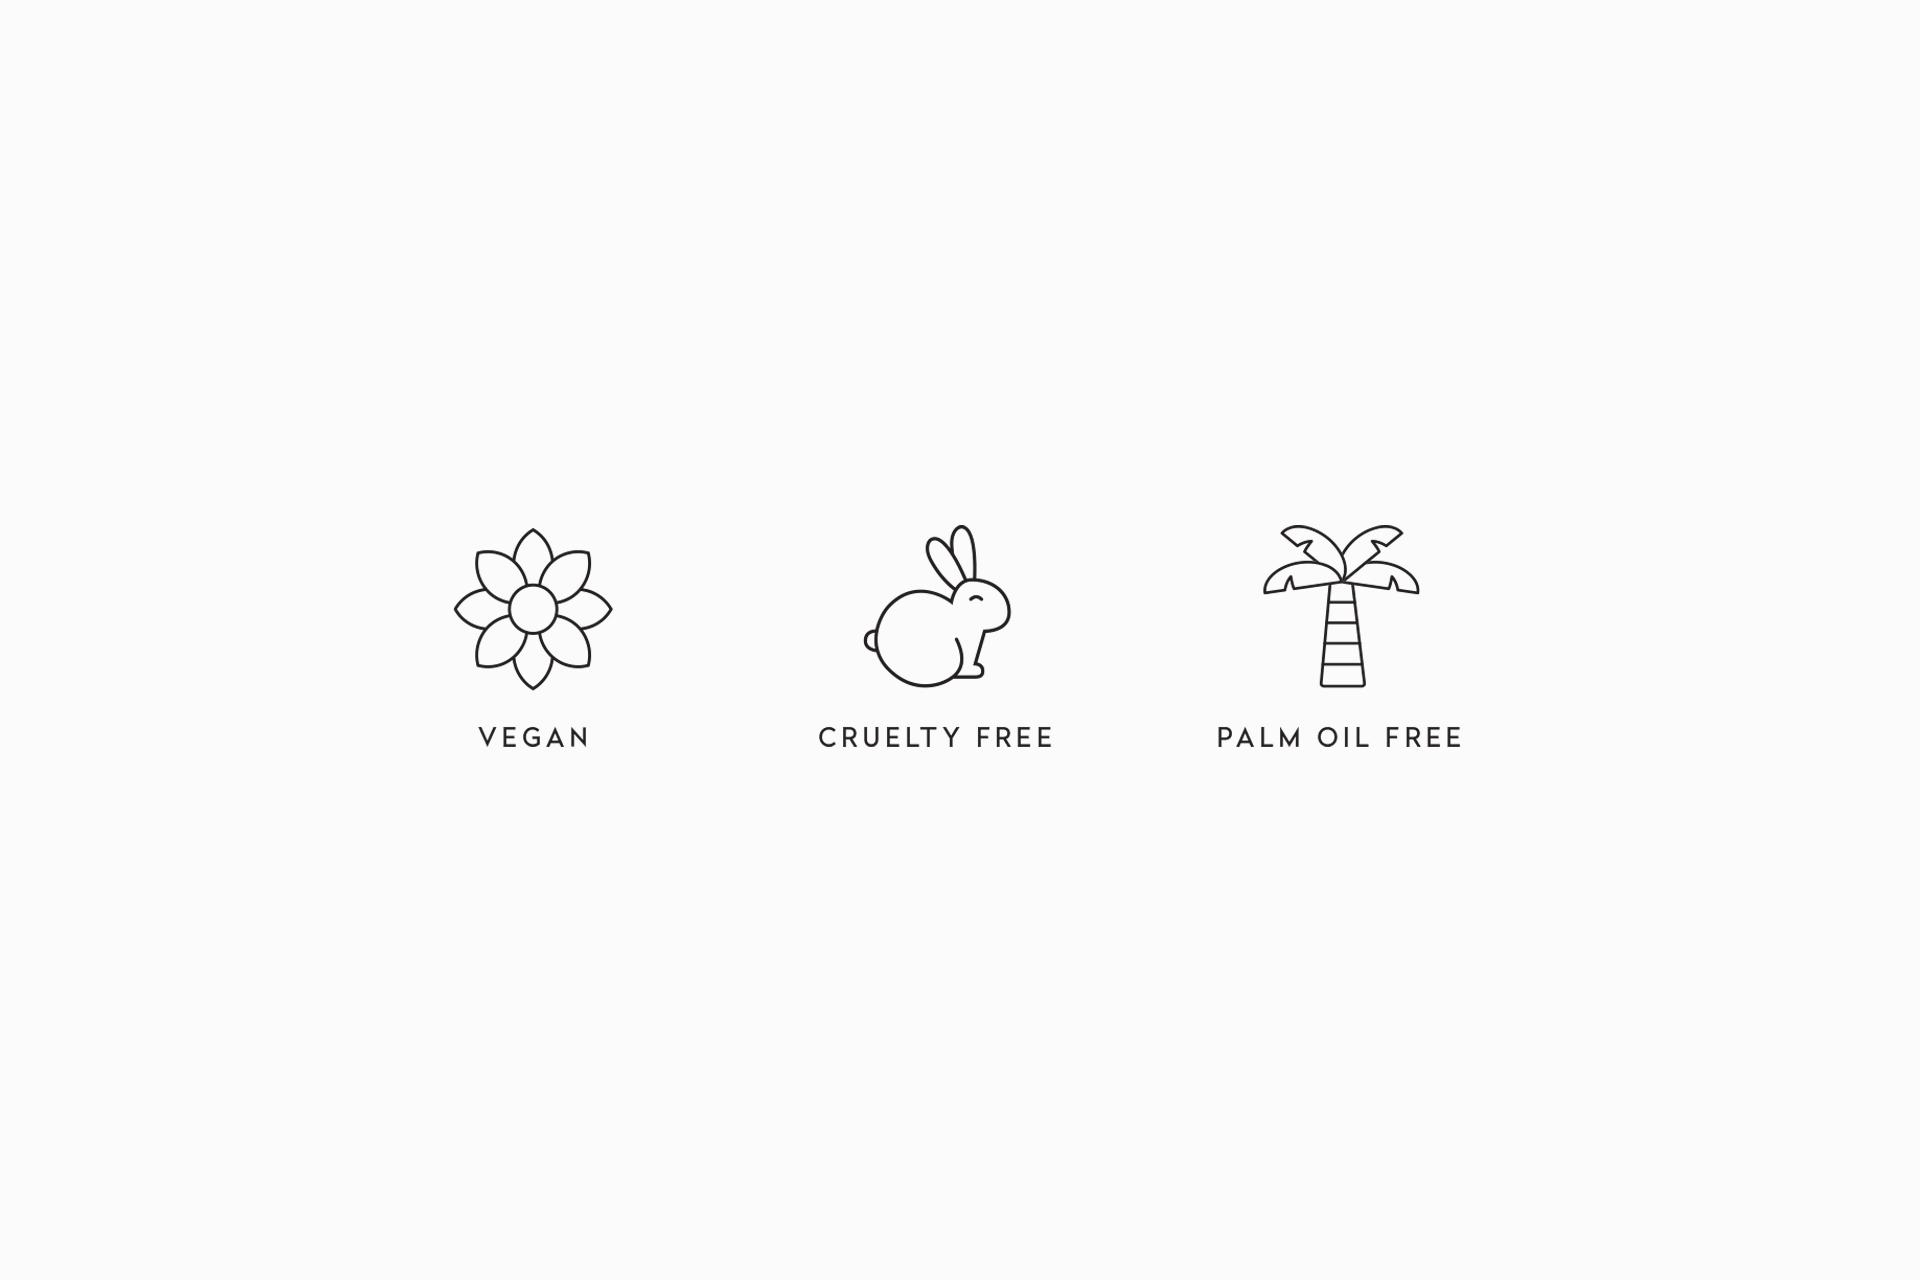 Primal_Essence_Icons